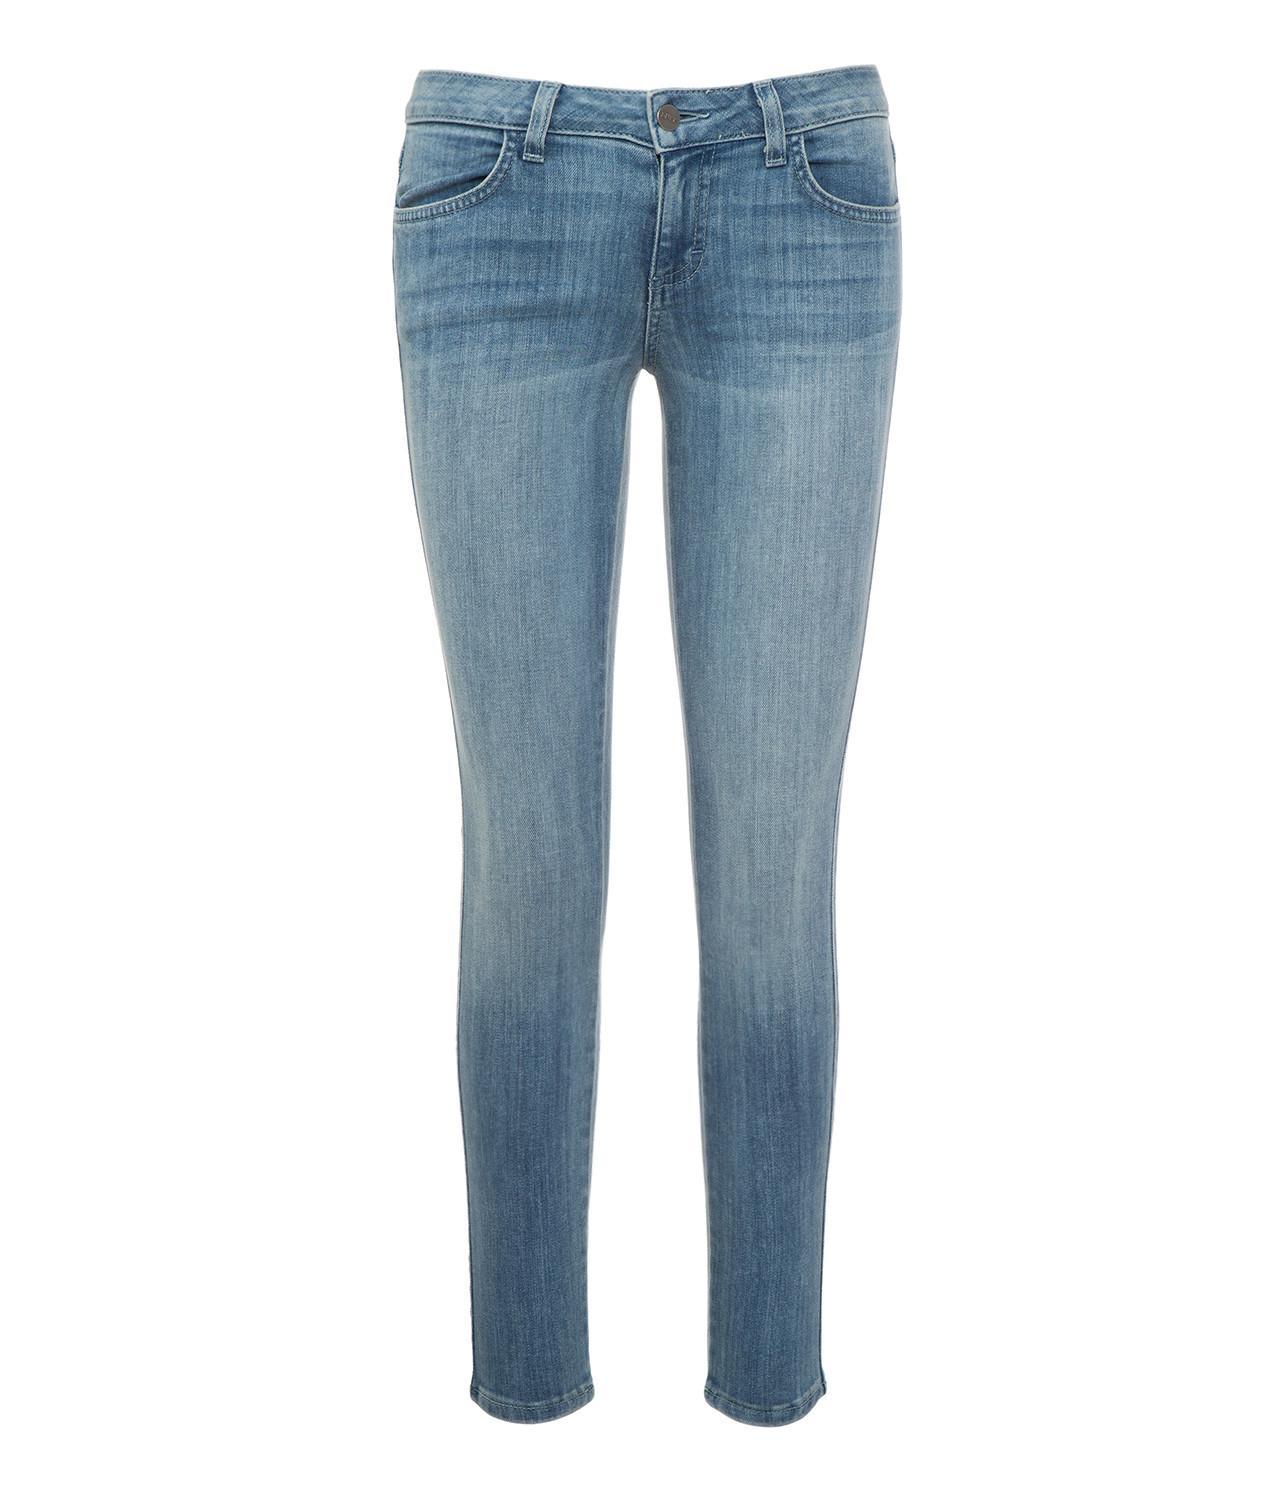 https   www.lyst.com clothing jason-wu-shiny-viscose-short-sleeve-top ... 5a62a9ee76eb